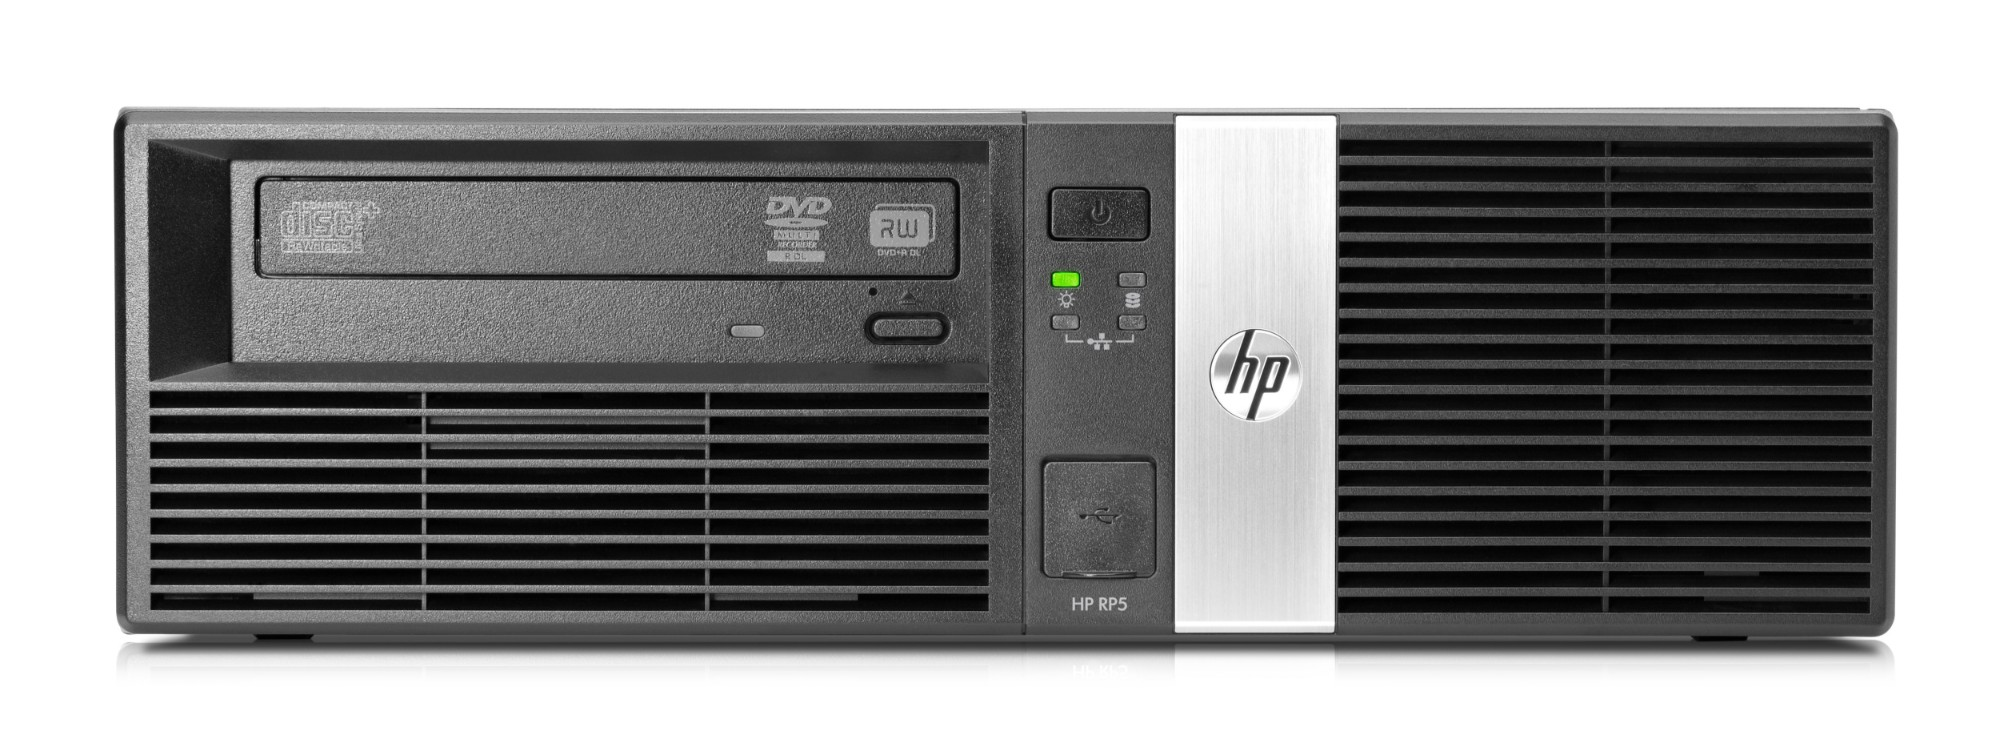 RP5810 POS - i5 4570S - 16GB RAM - 500GB HDD - Win10 Pro